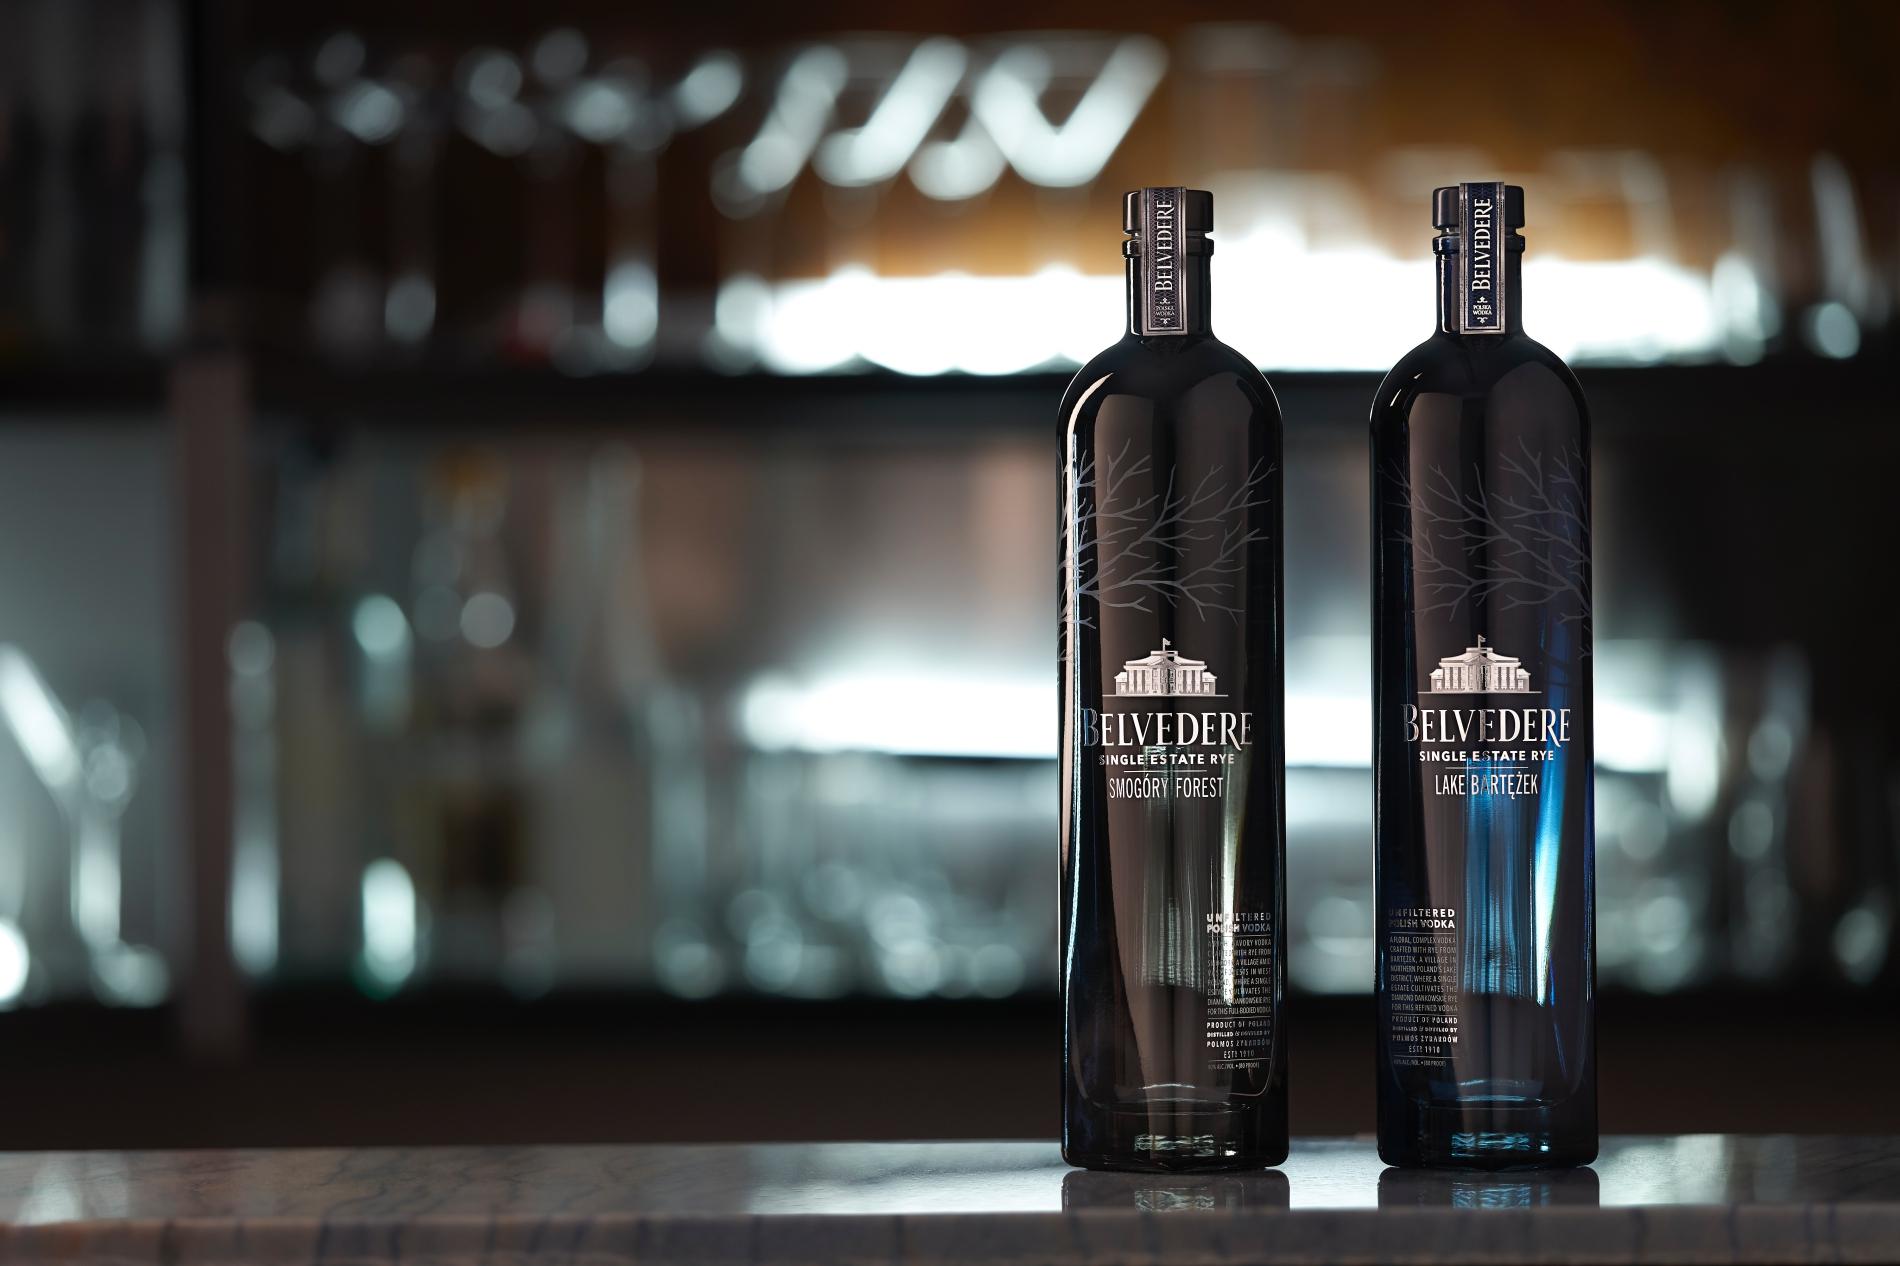 Belvedere Single Estate Rye Vodkas